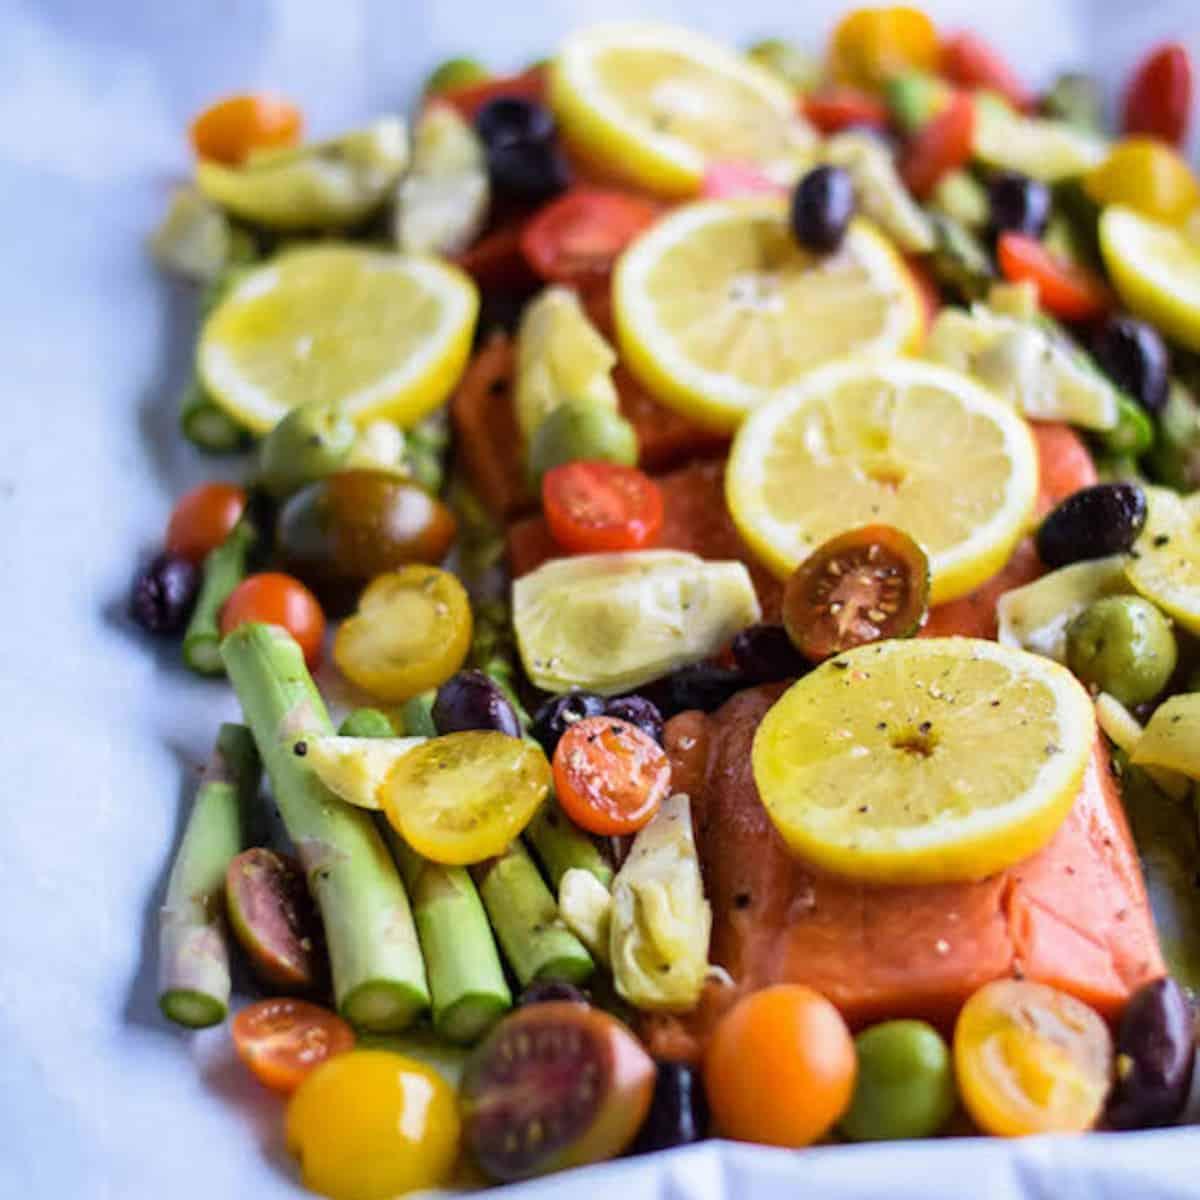 salmon and veggies on a sheet pan